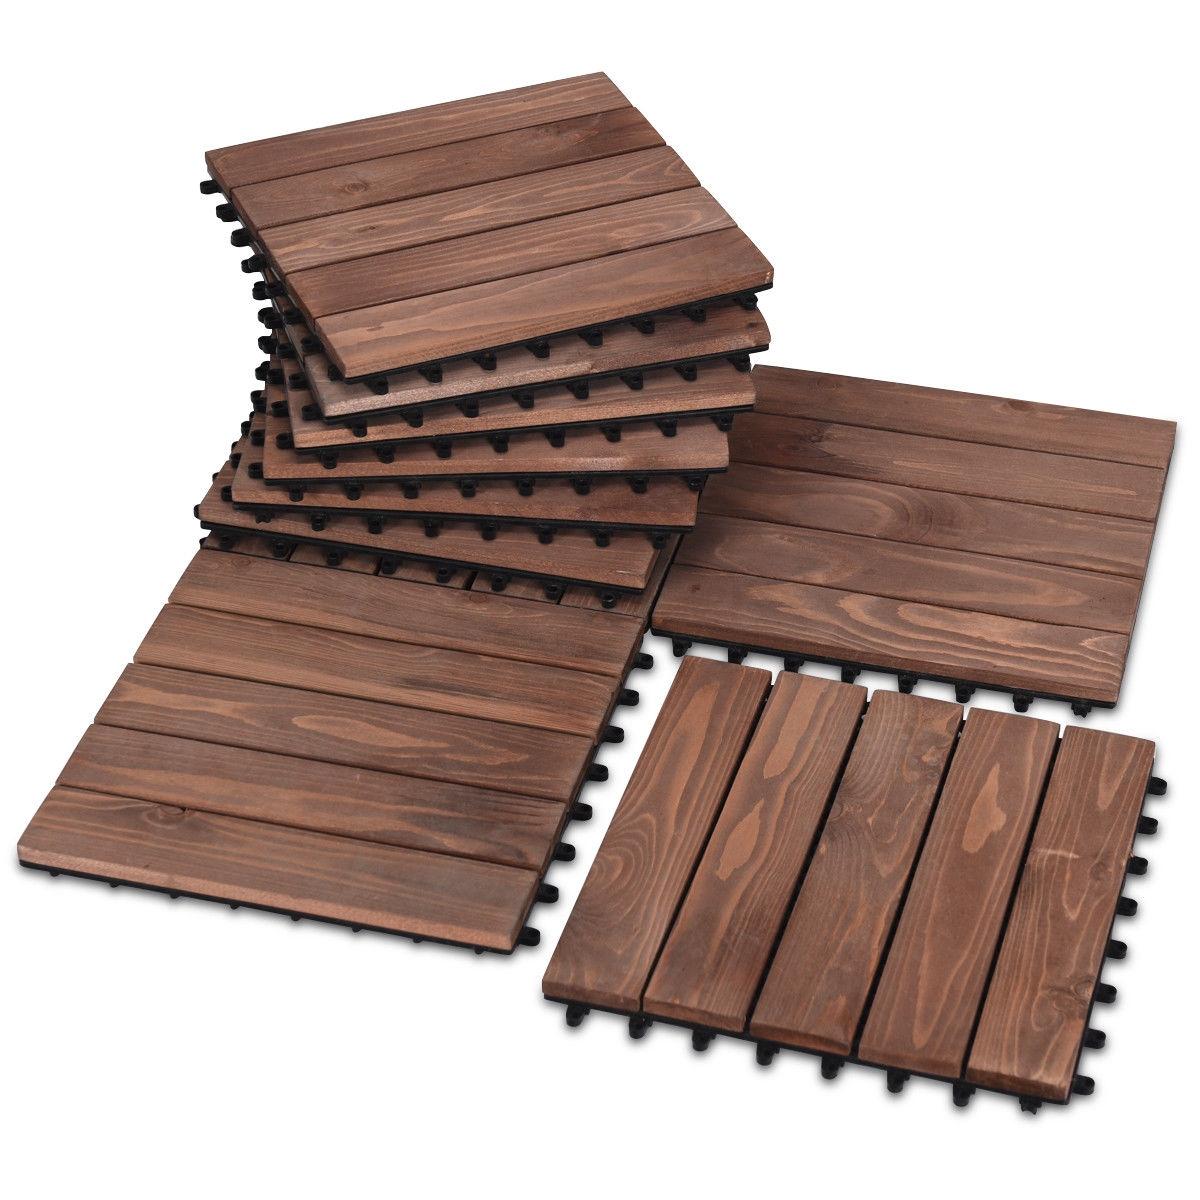 12 x 12 patio interlocking flooring